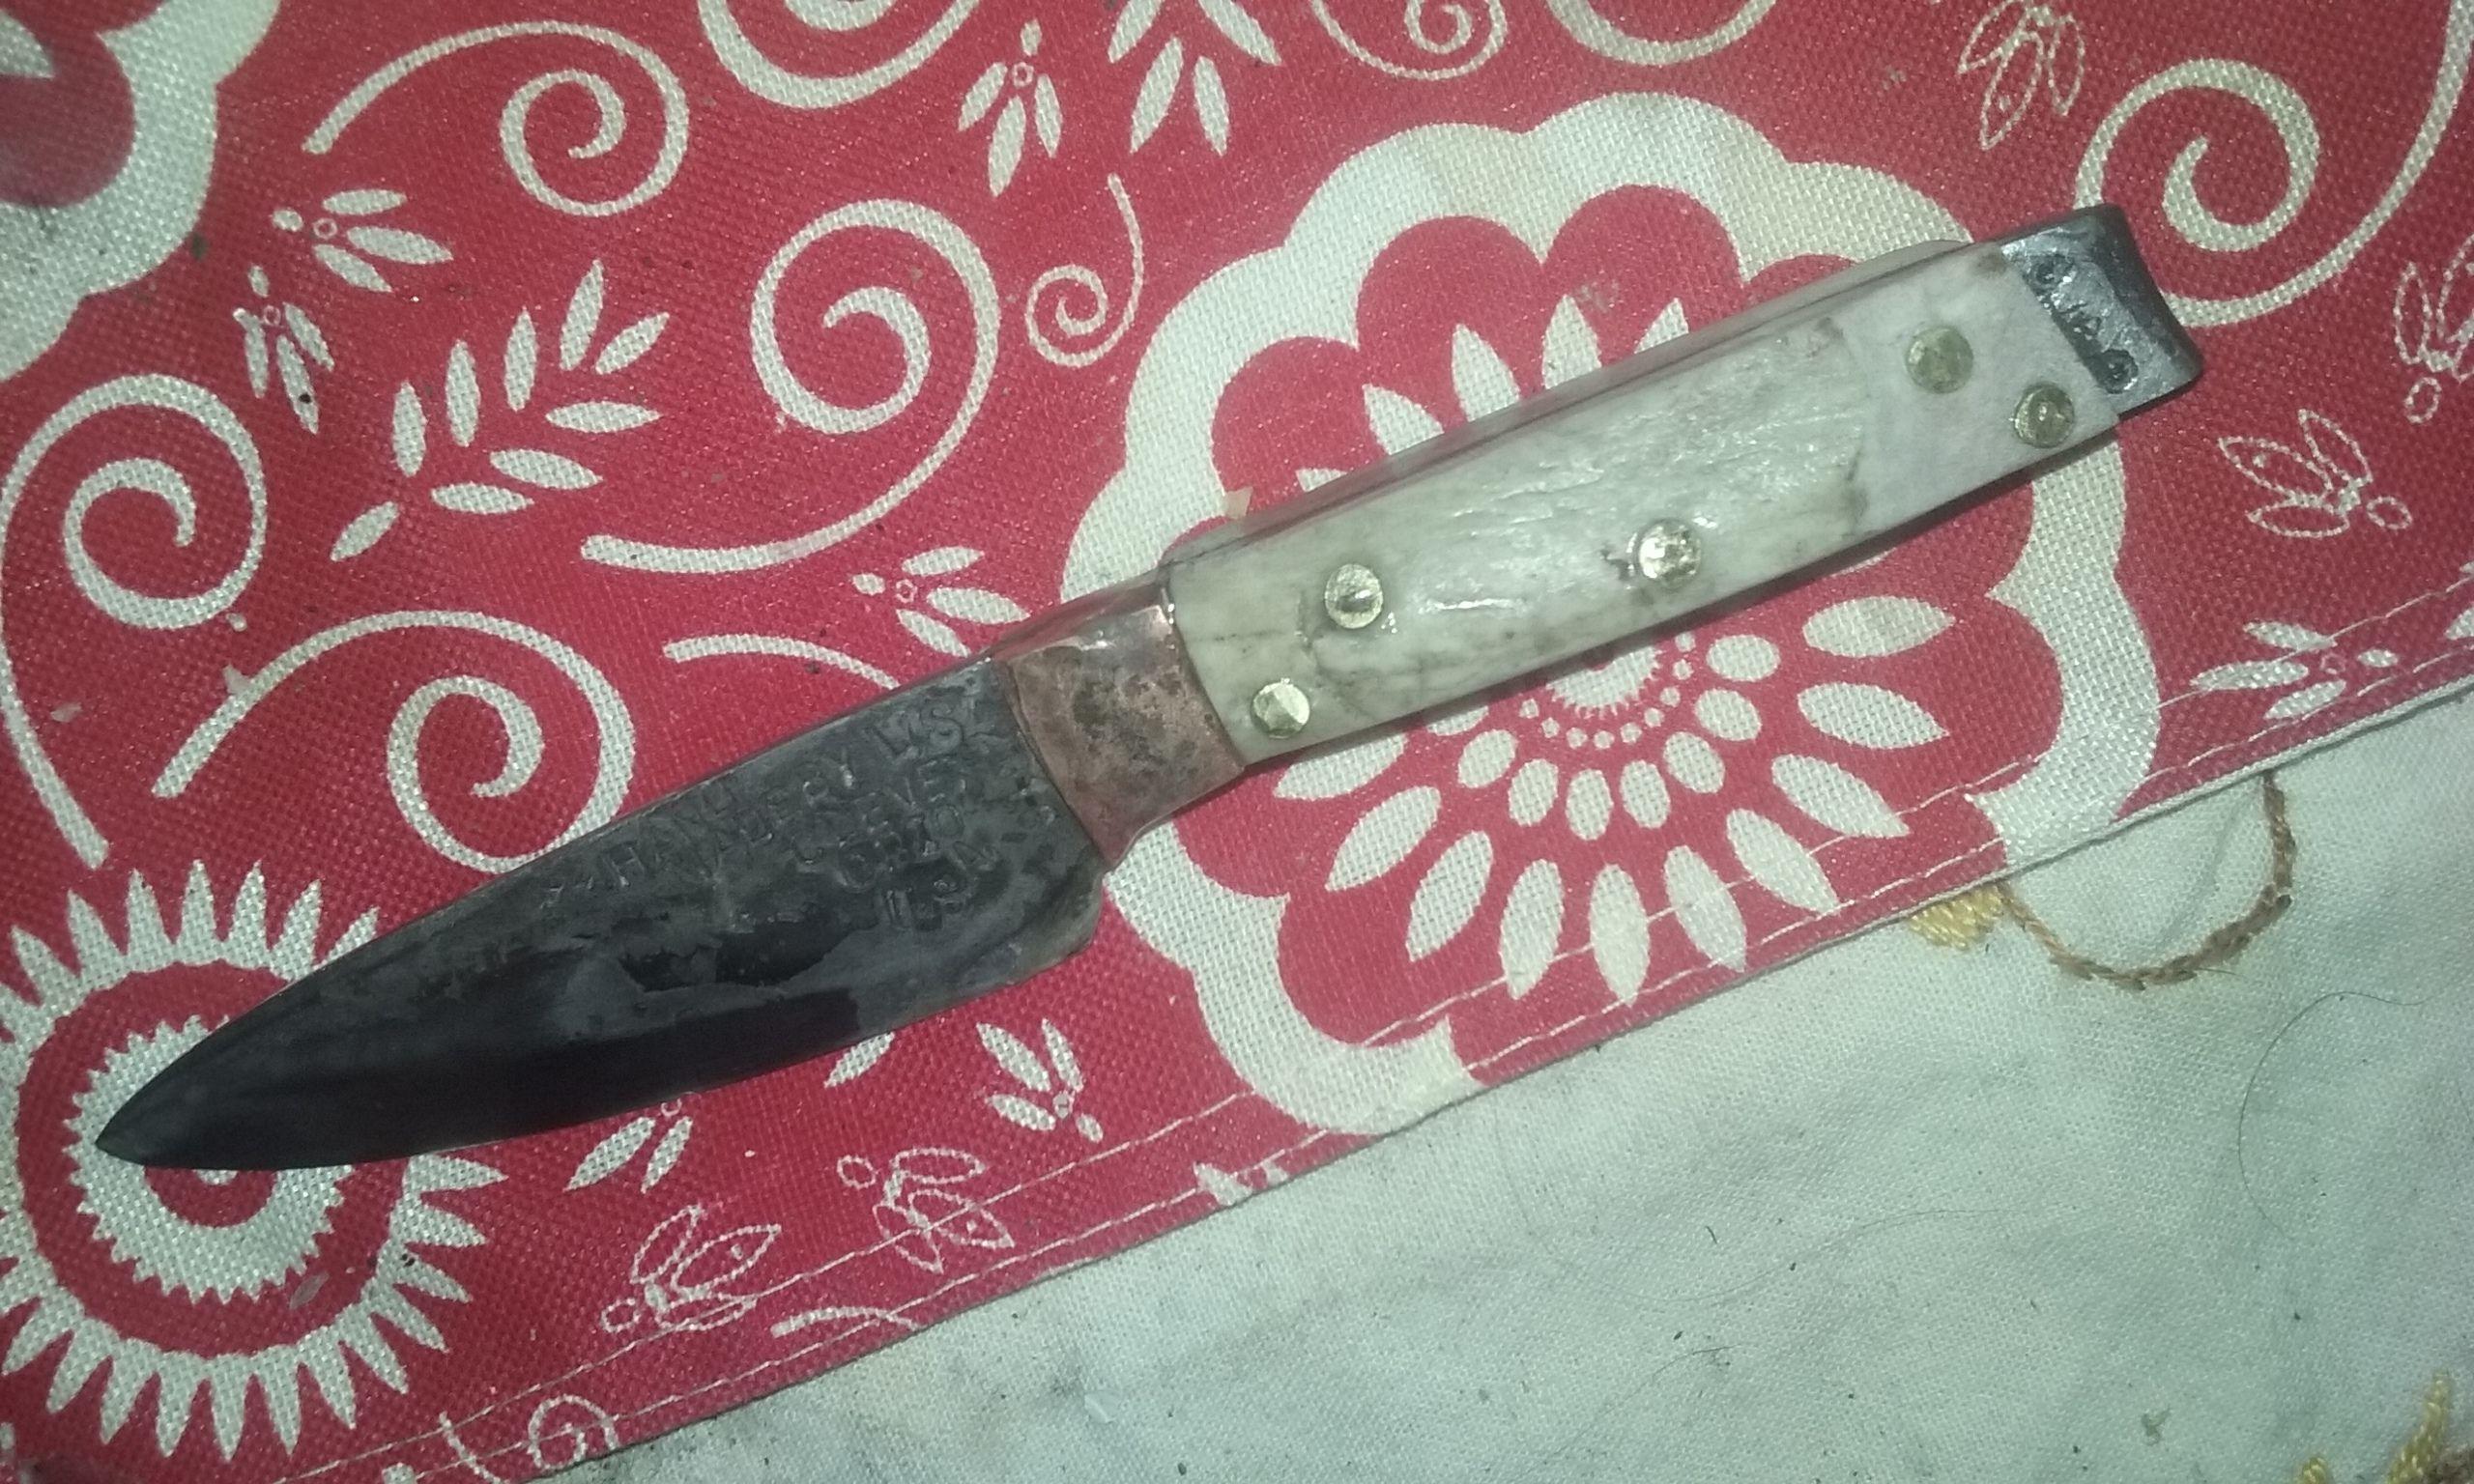 hand made high carbon blue paper steel kitchen knife by hand custom made high carbon blue paper steel kitchen knife